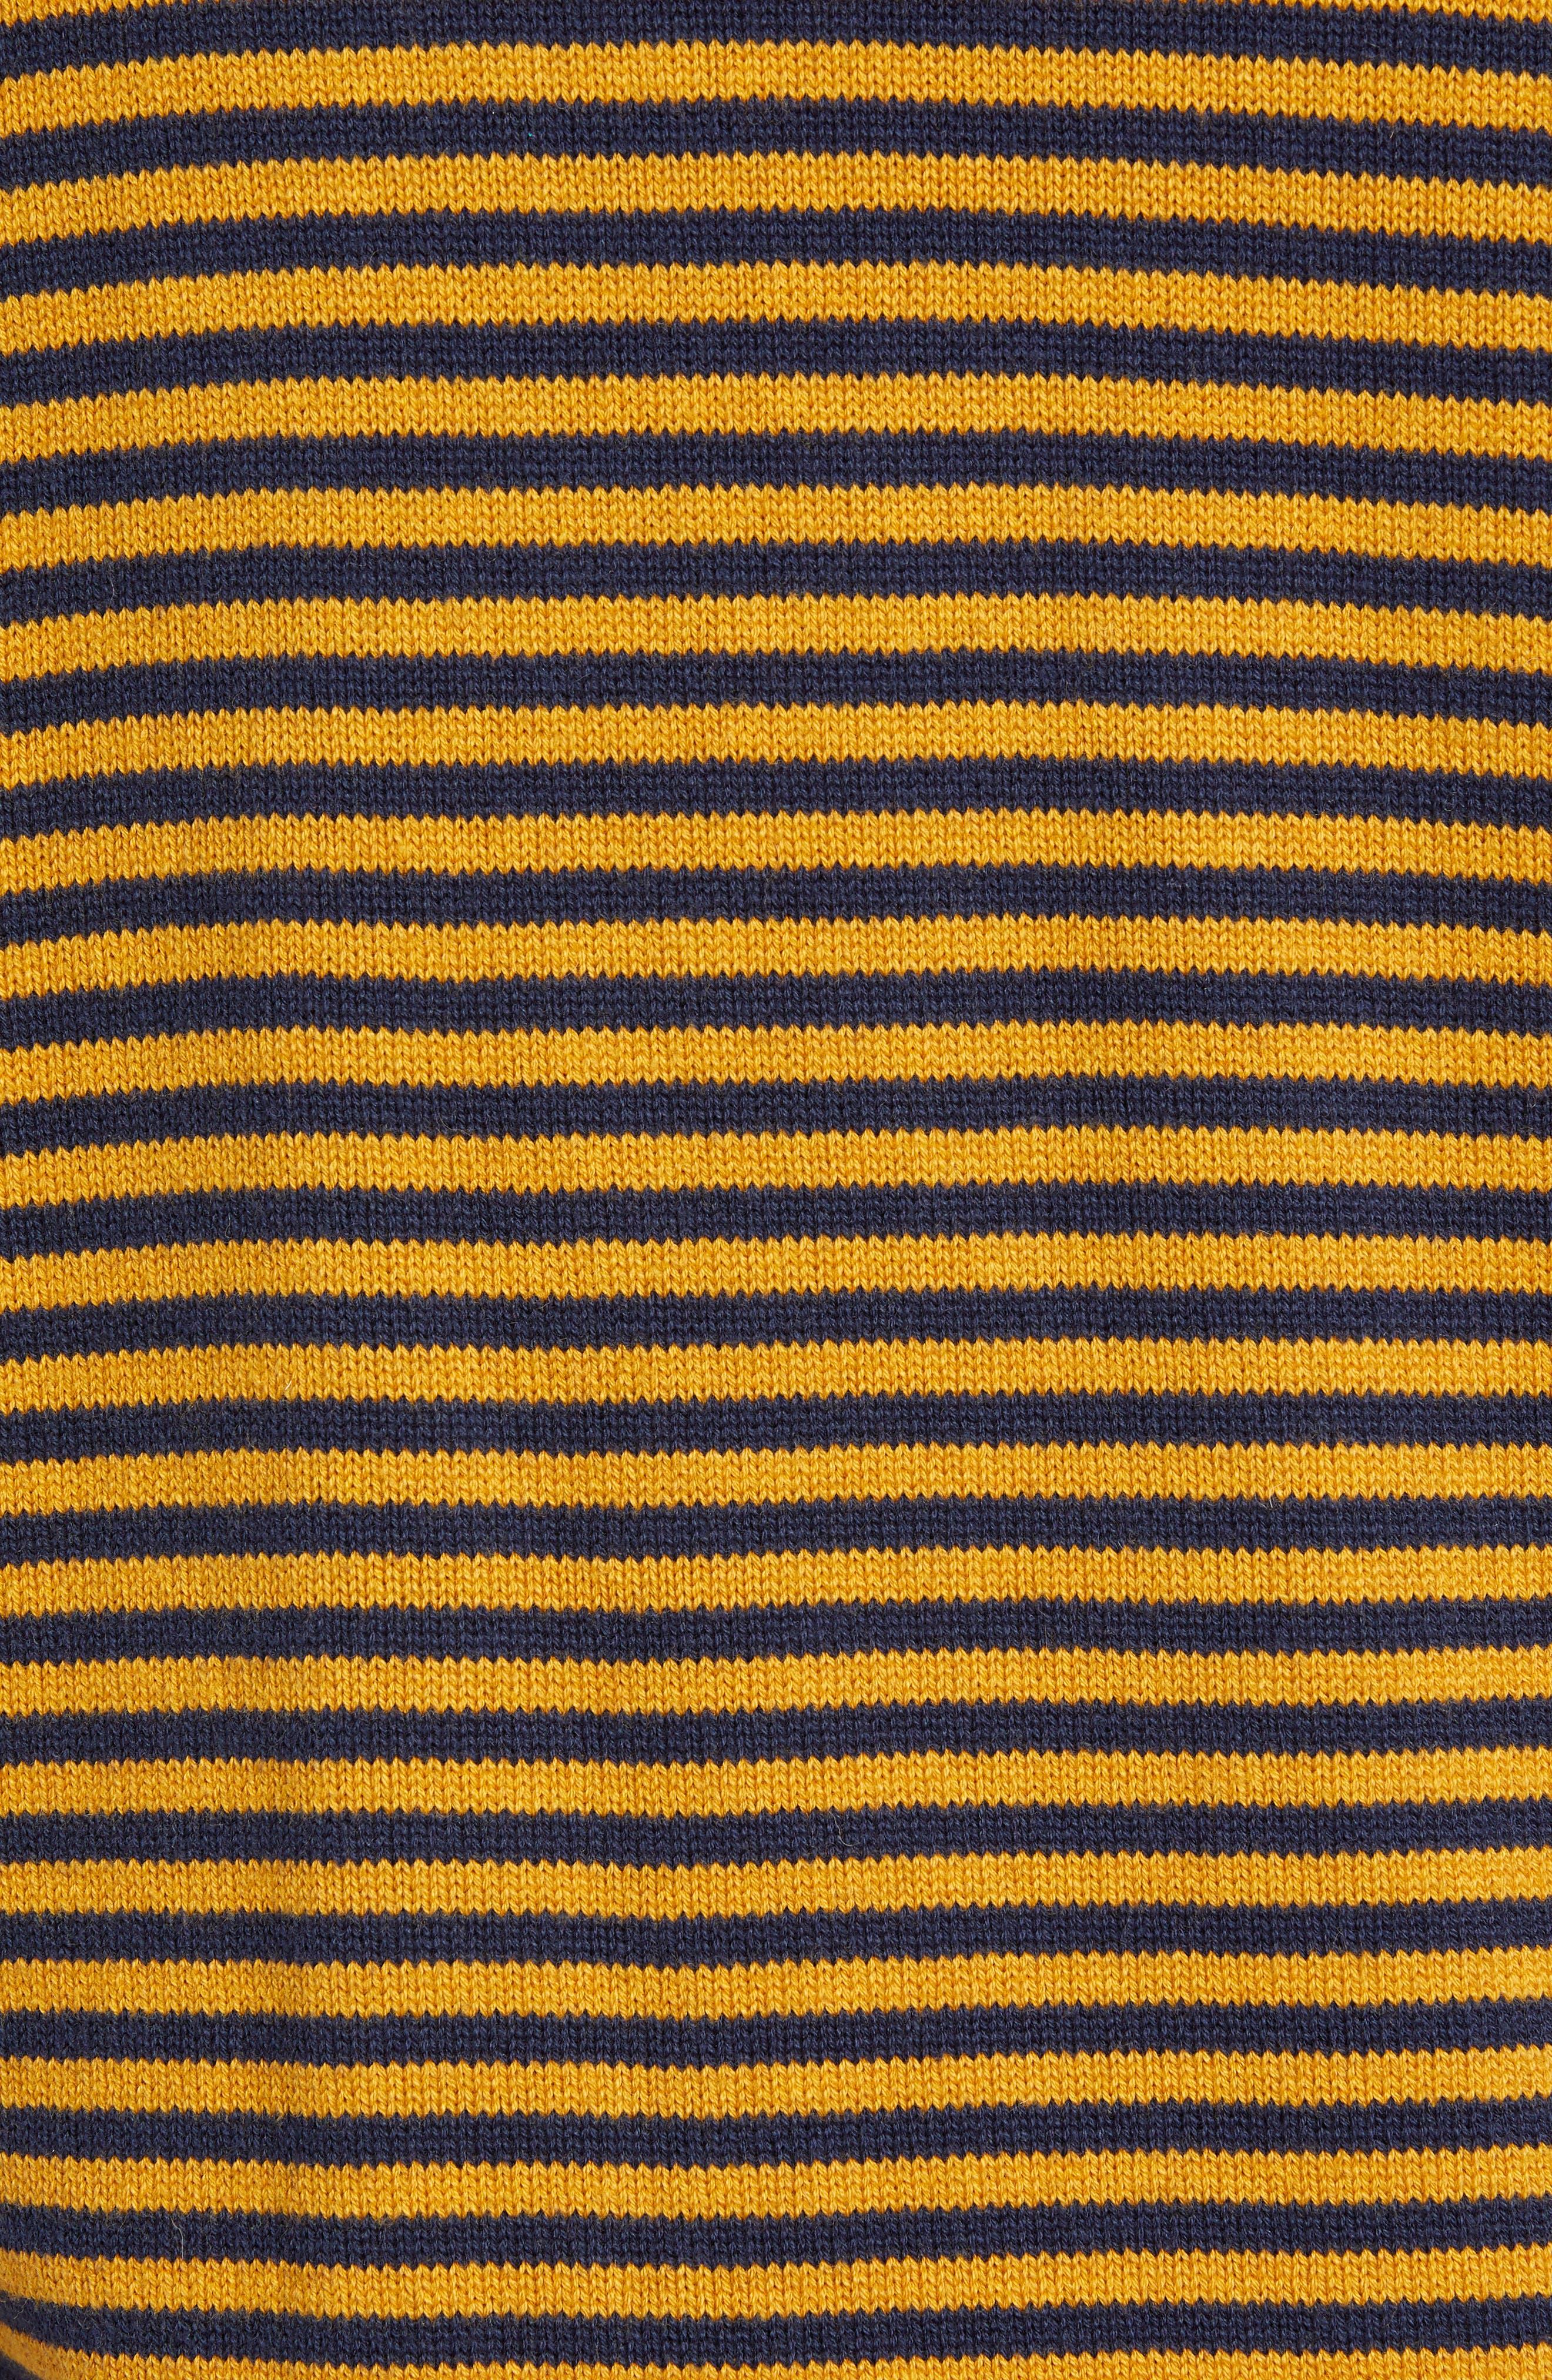 Stripe Cotton & Wool Sweater,                             Alternate thumbnail 5, color,                             CALLUNA YELLOW UTILITY BLUE